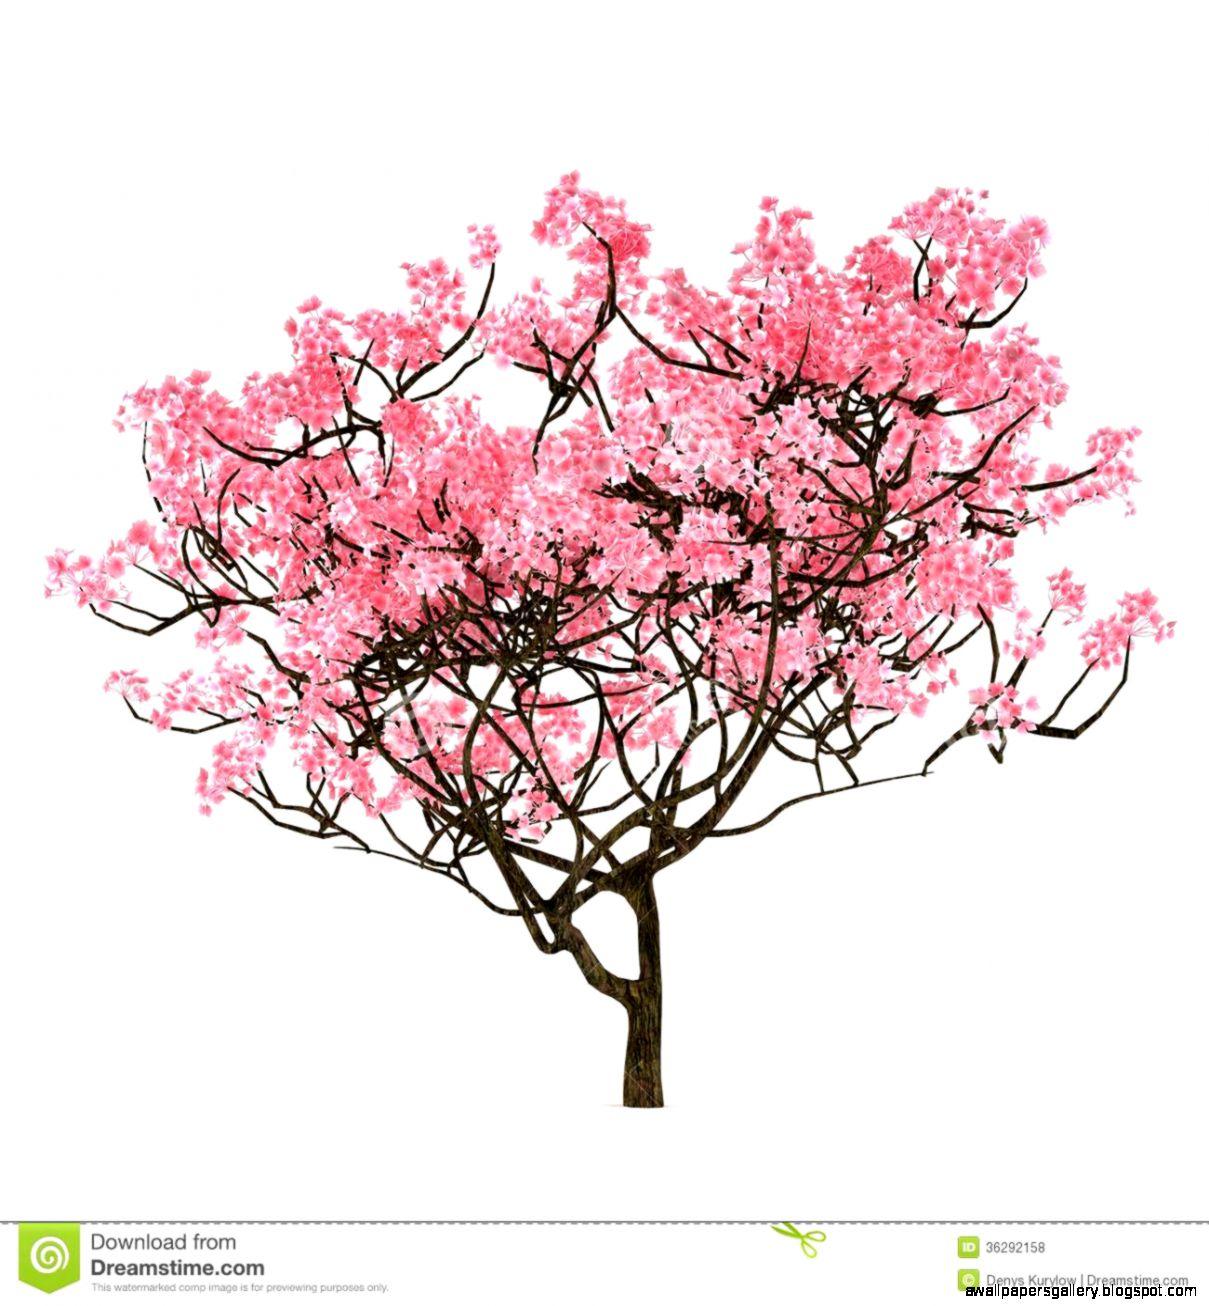 Drawn sakura blossom sakura tree Sketch Sakura Coloring Pencil Drawing